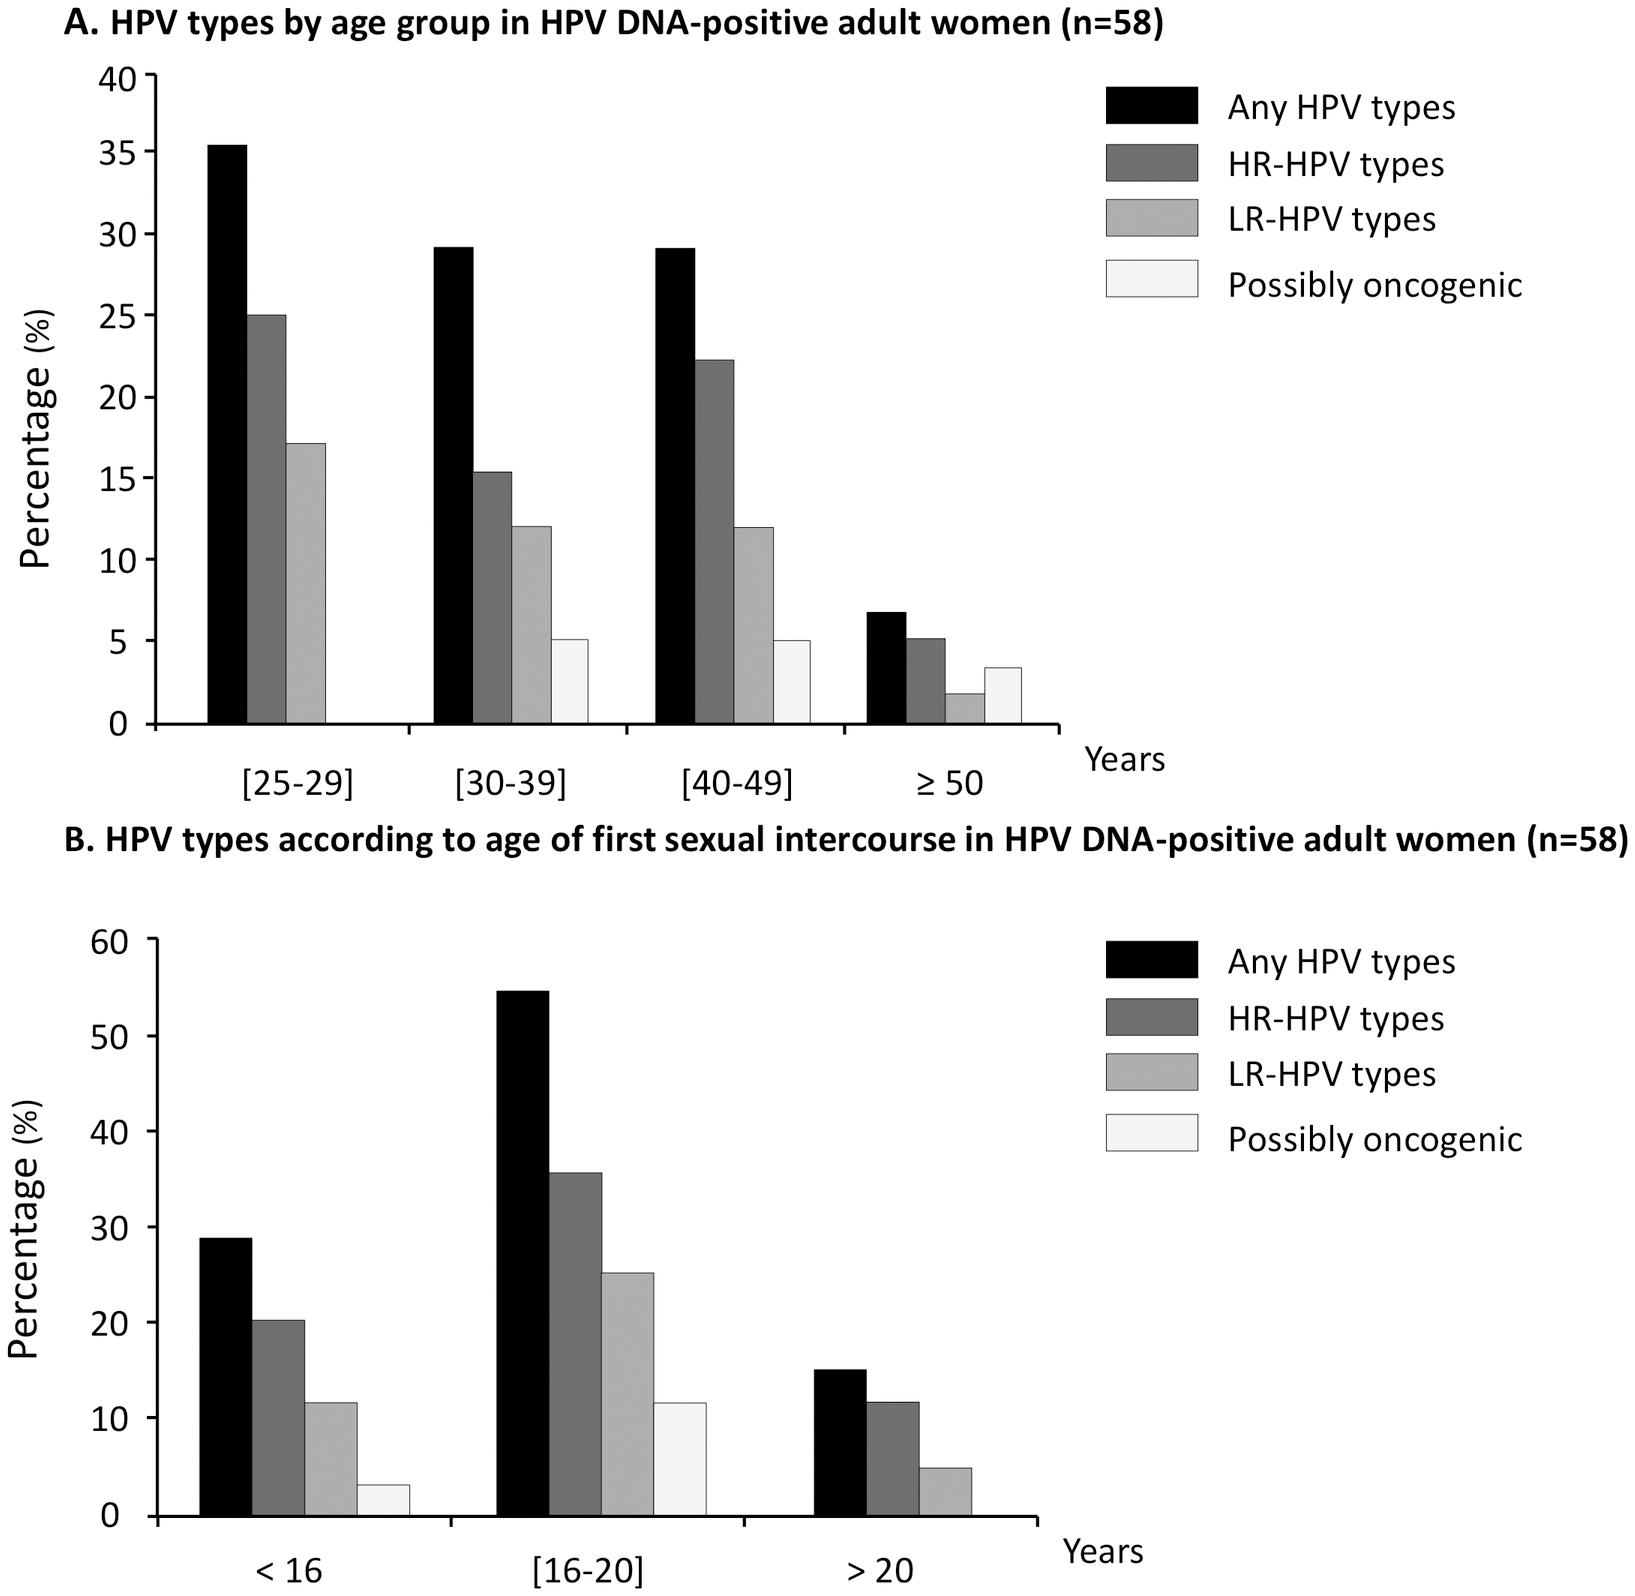 human papillomavirus 16 positive produse deparazitare oameni